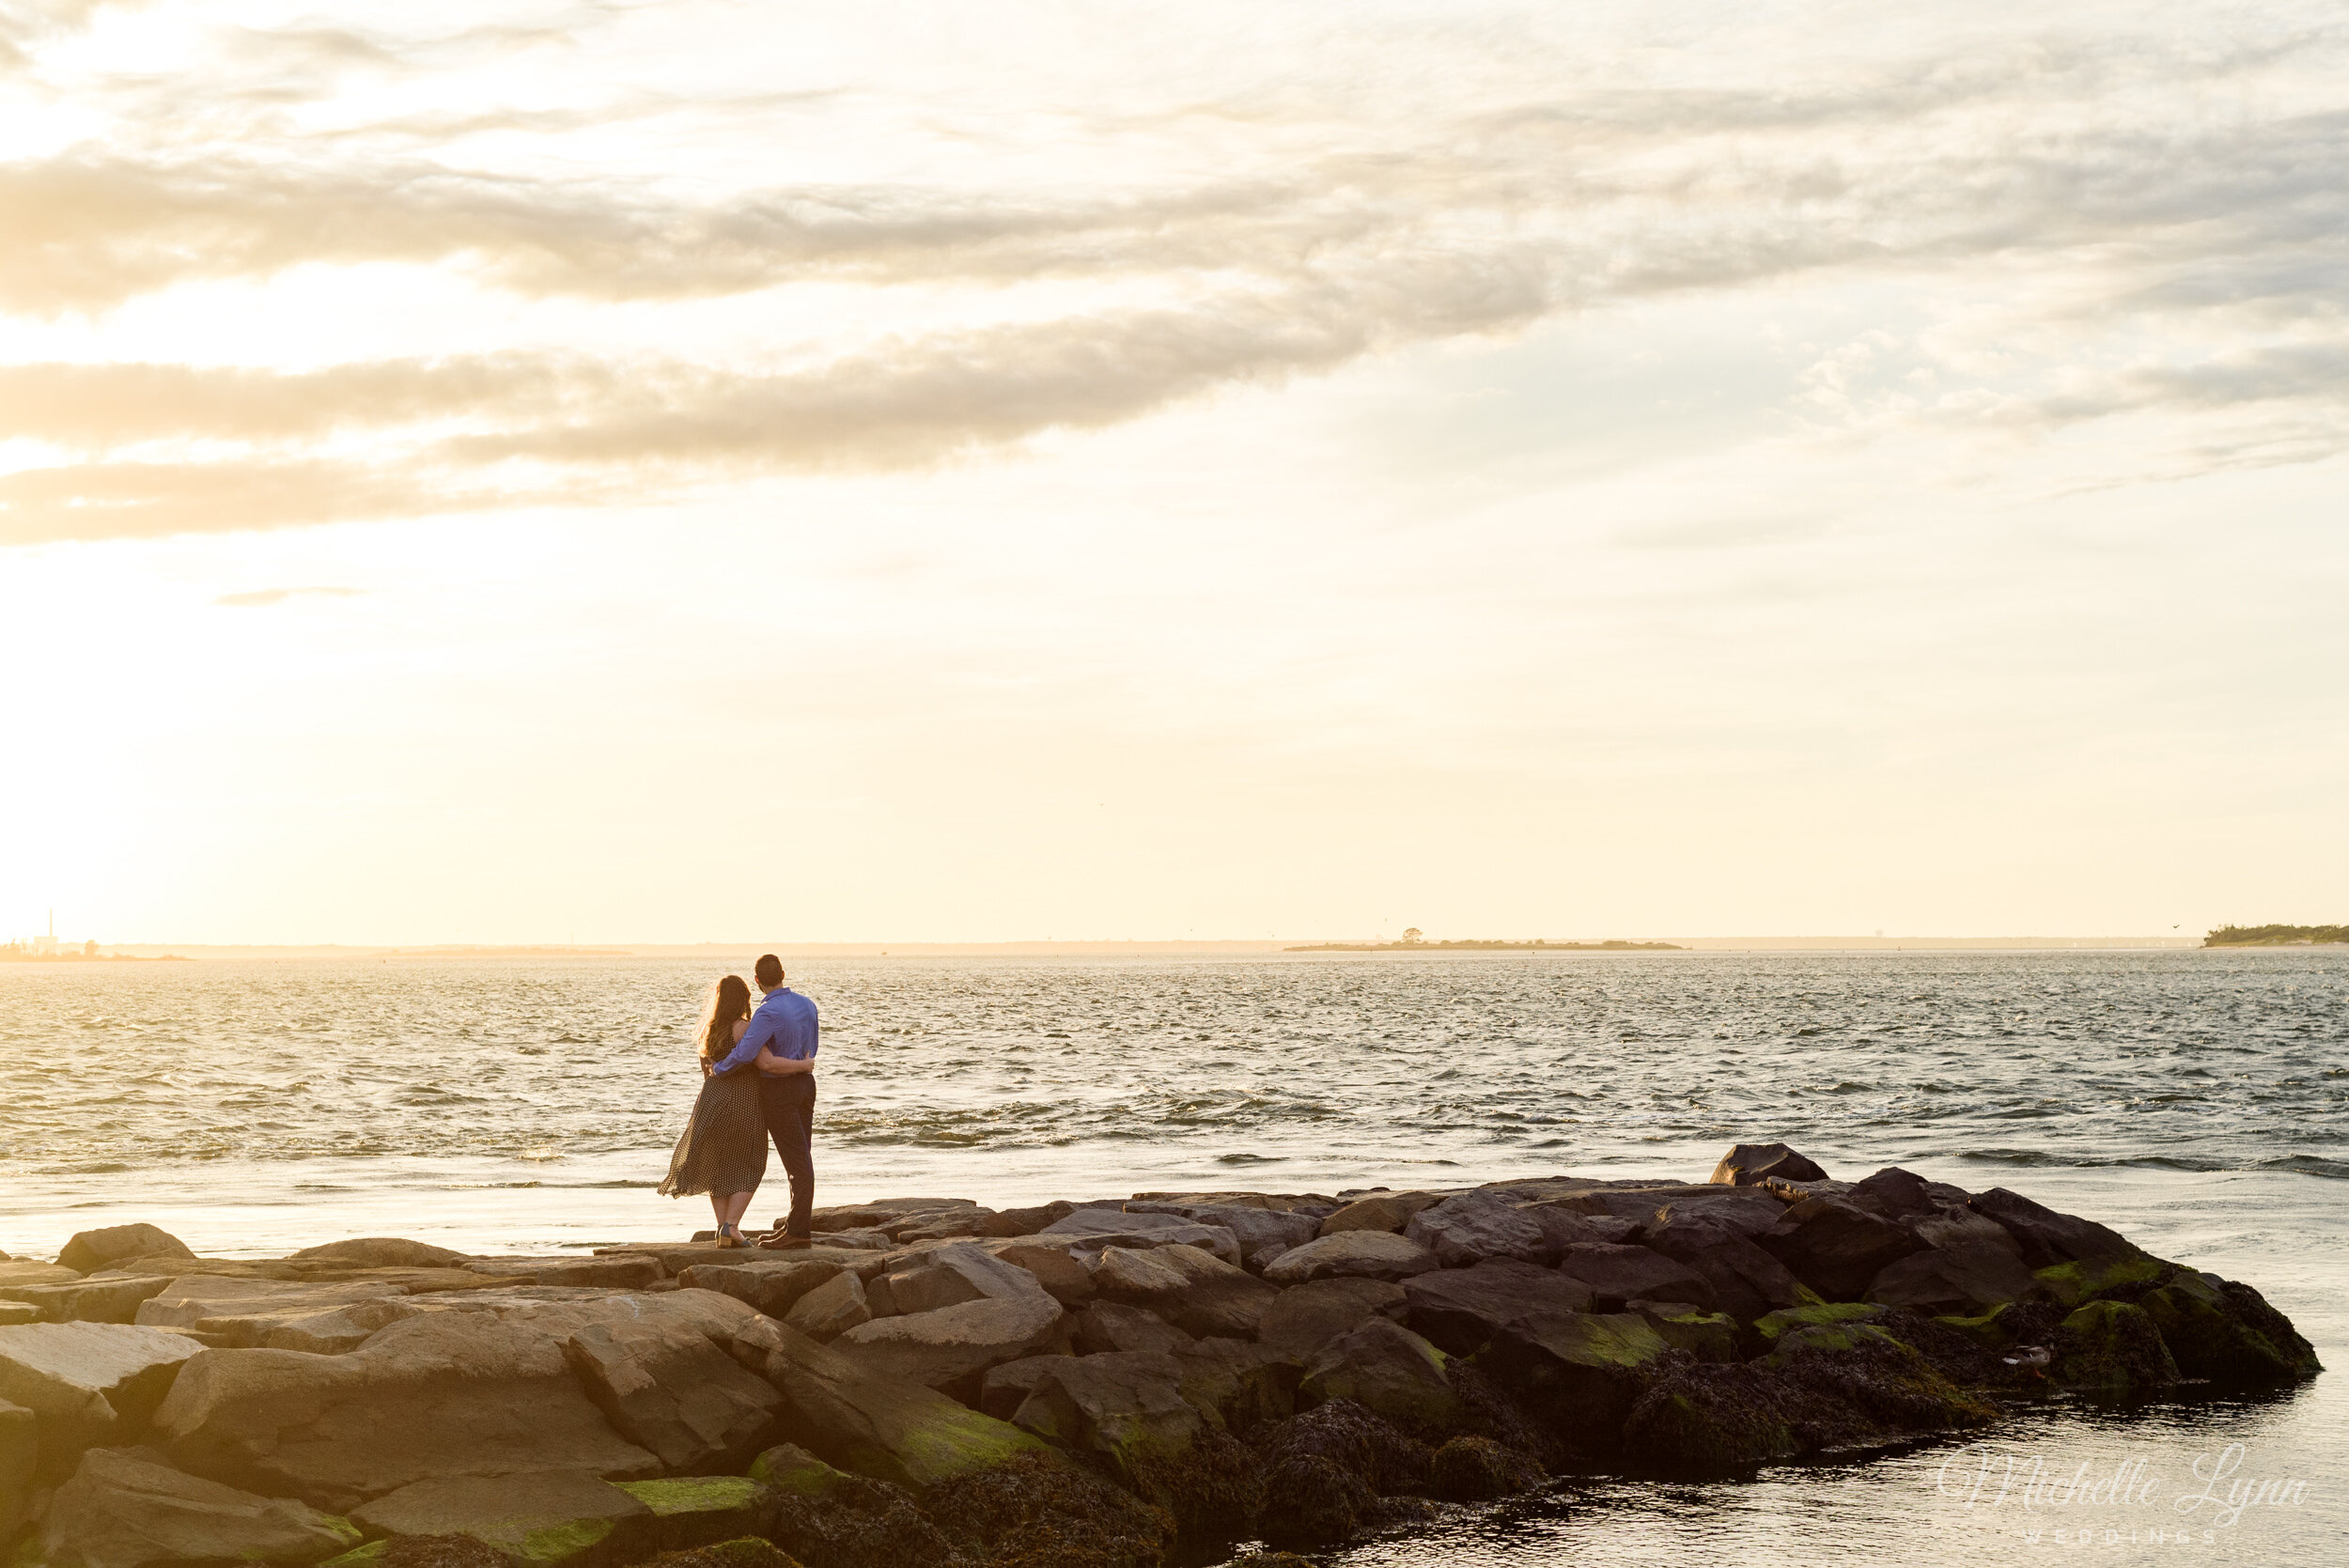 barnegat-lighthouse-engagement-photos-michelle-lynn-weddings-25.jpg